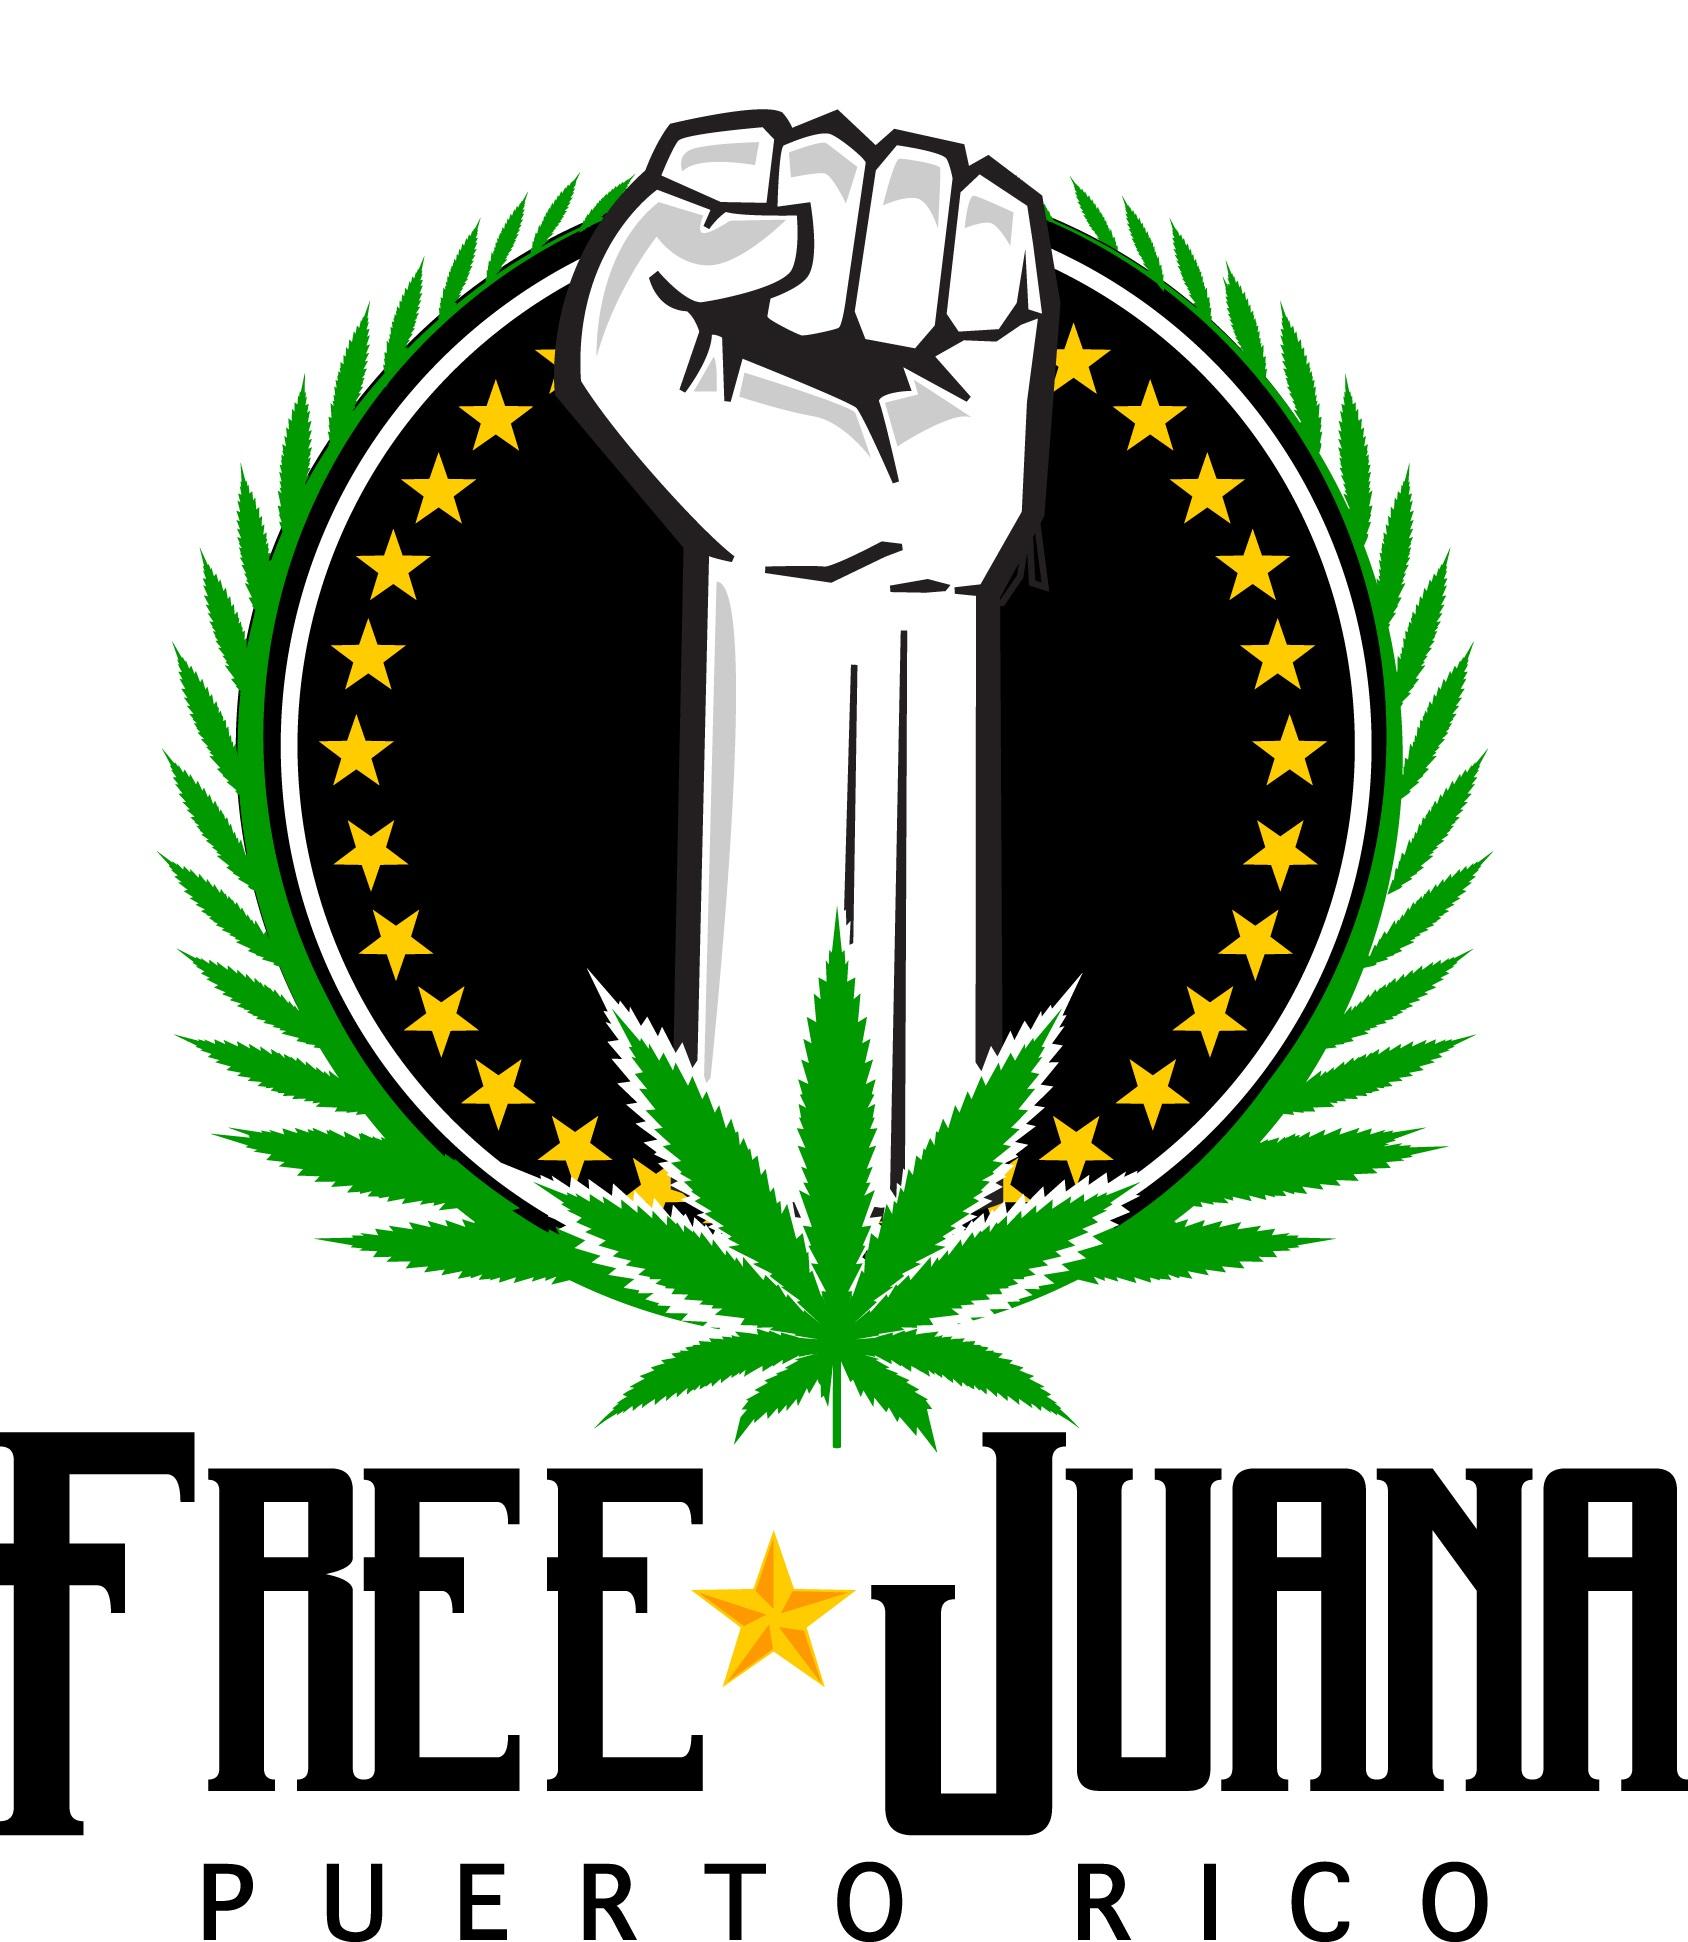 FREE JUANA FLYER.jpg